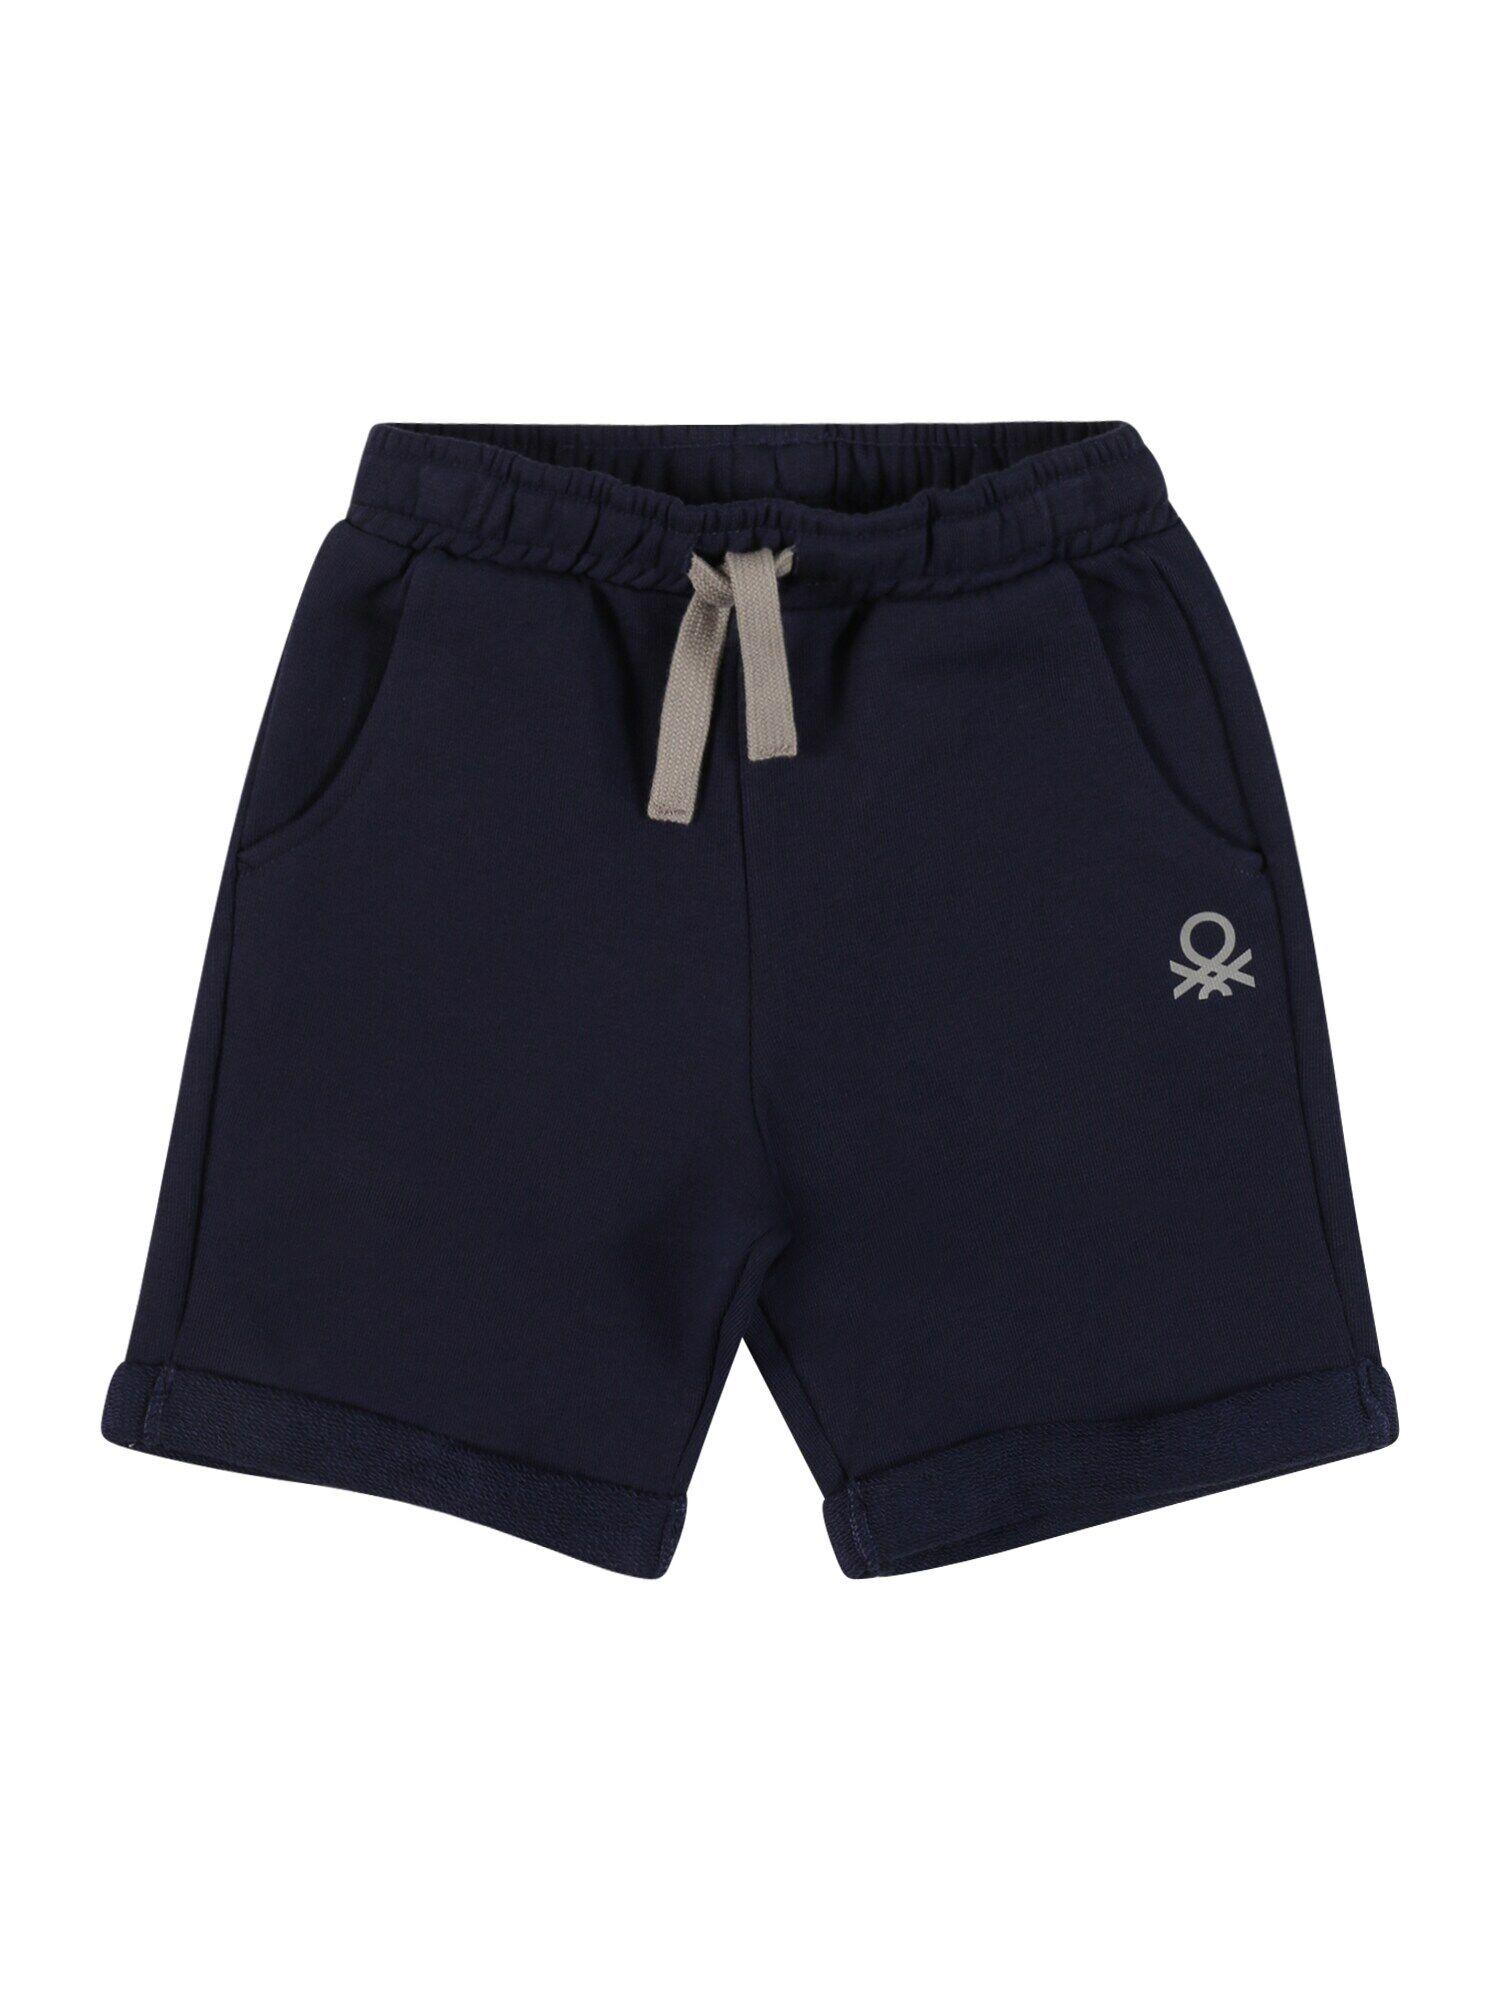 United Pantalon  - Bleu - Taille: 83 - boy